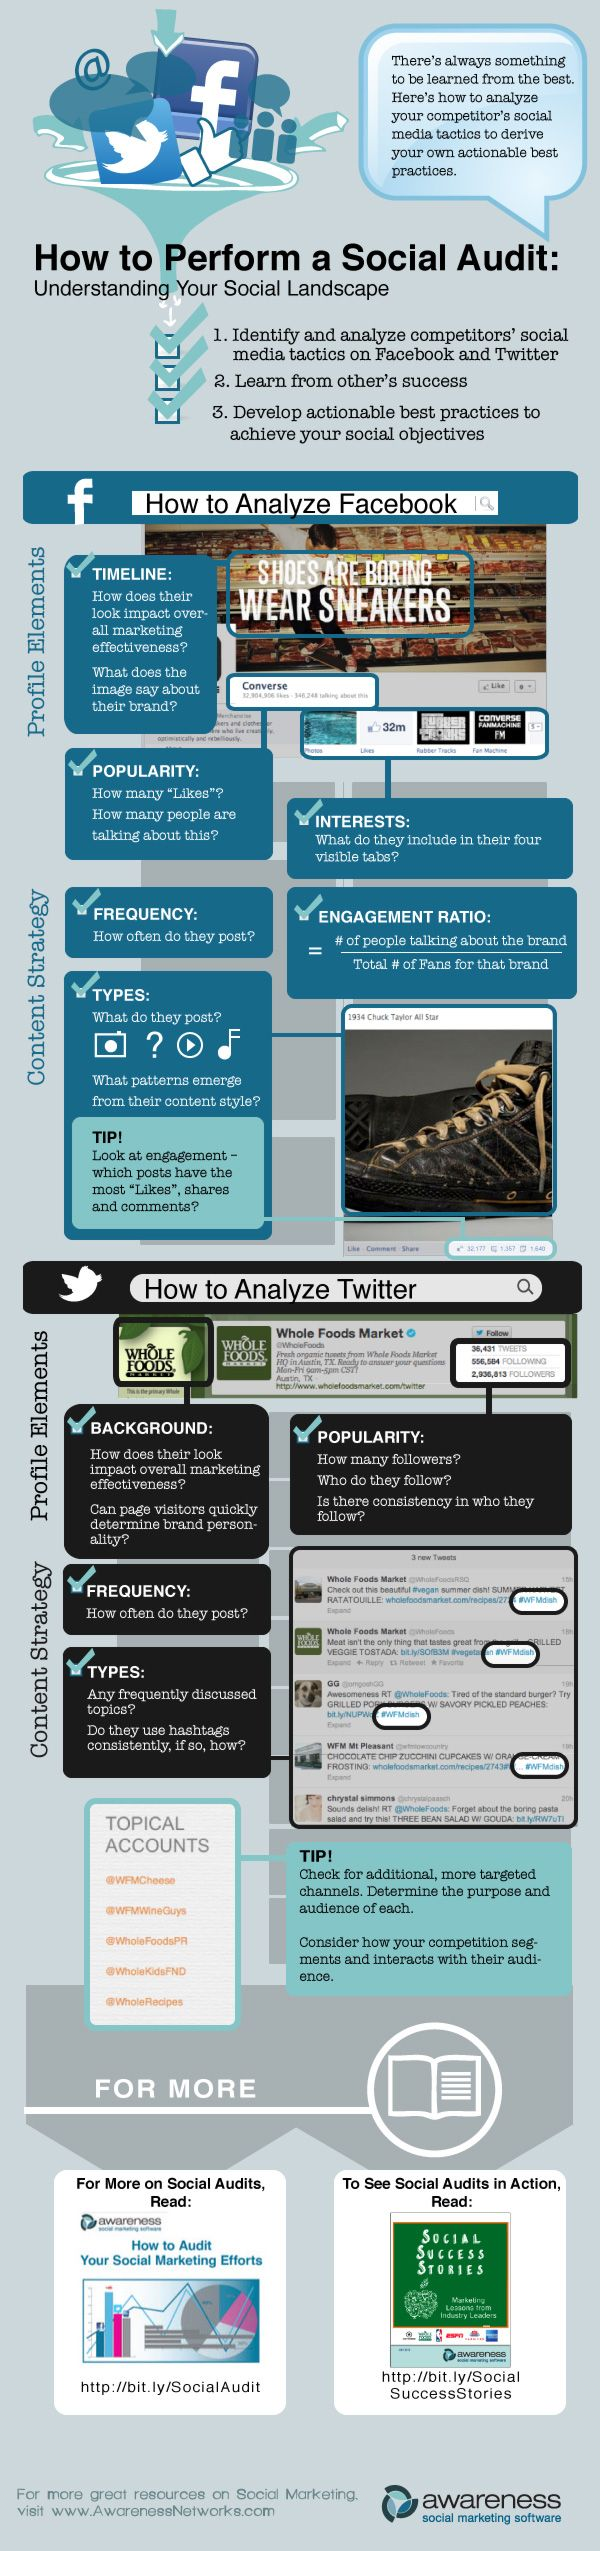 How to Audit Social Media